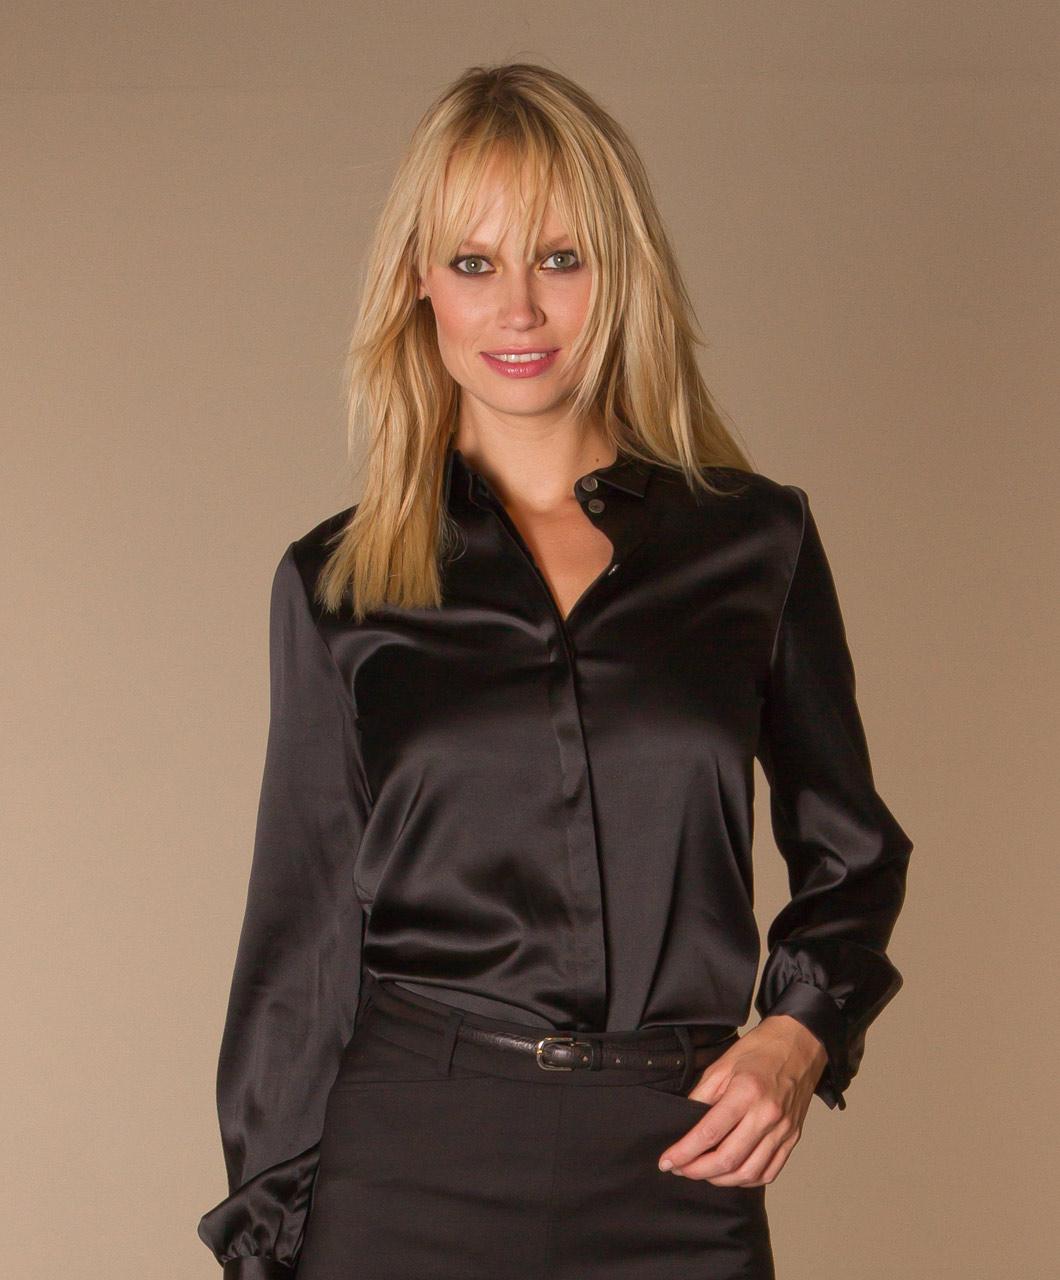 satijnen zwarte blouse